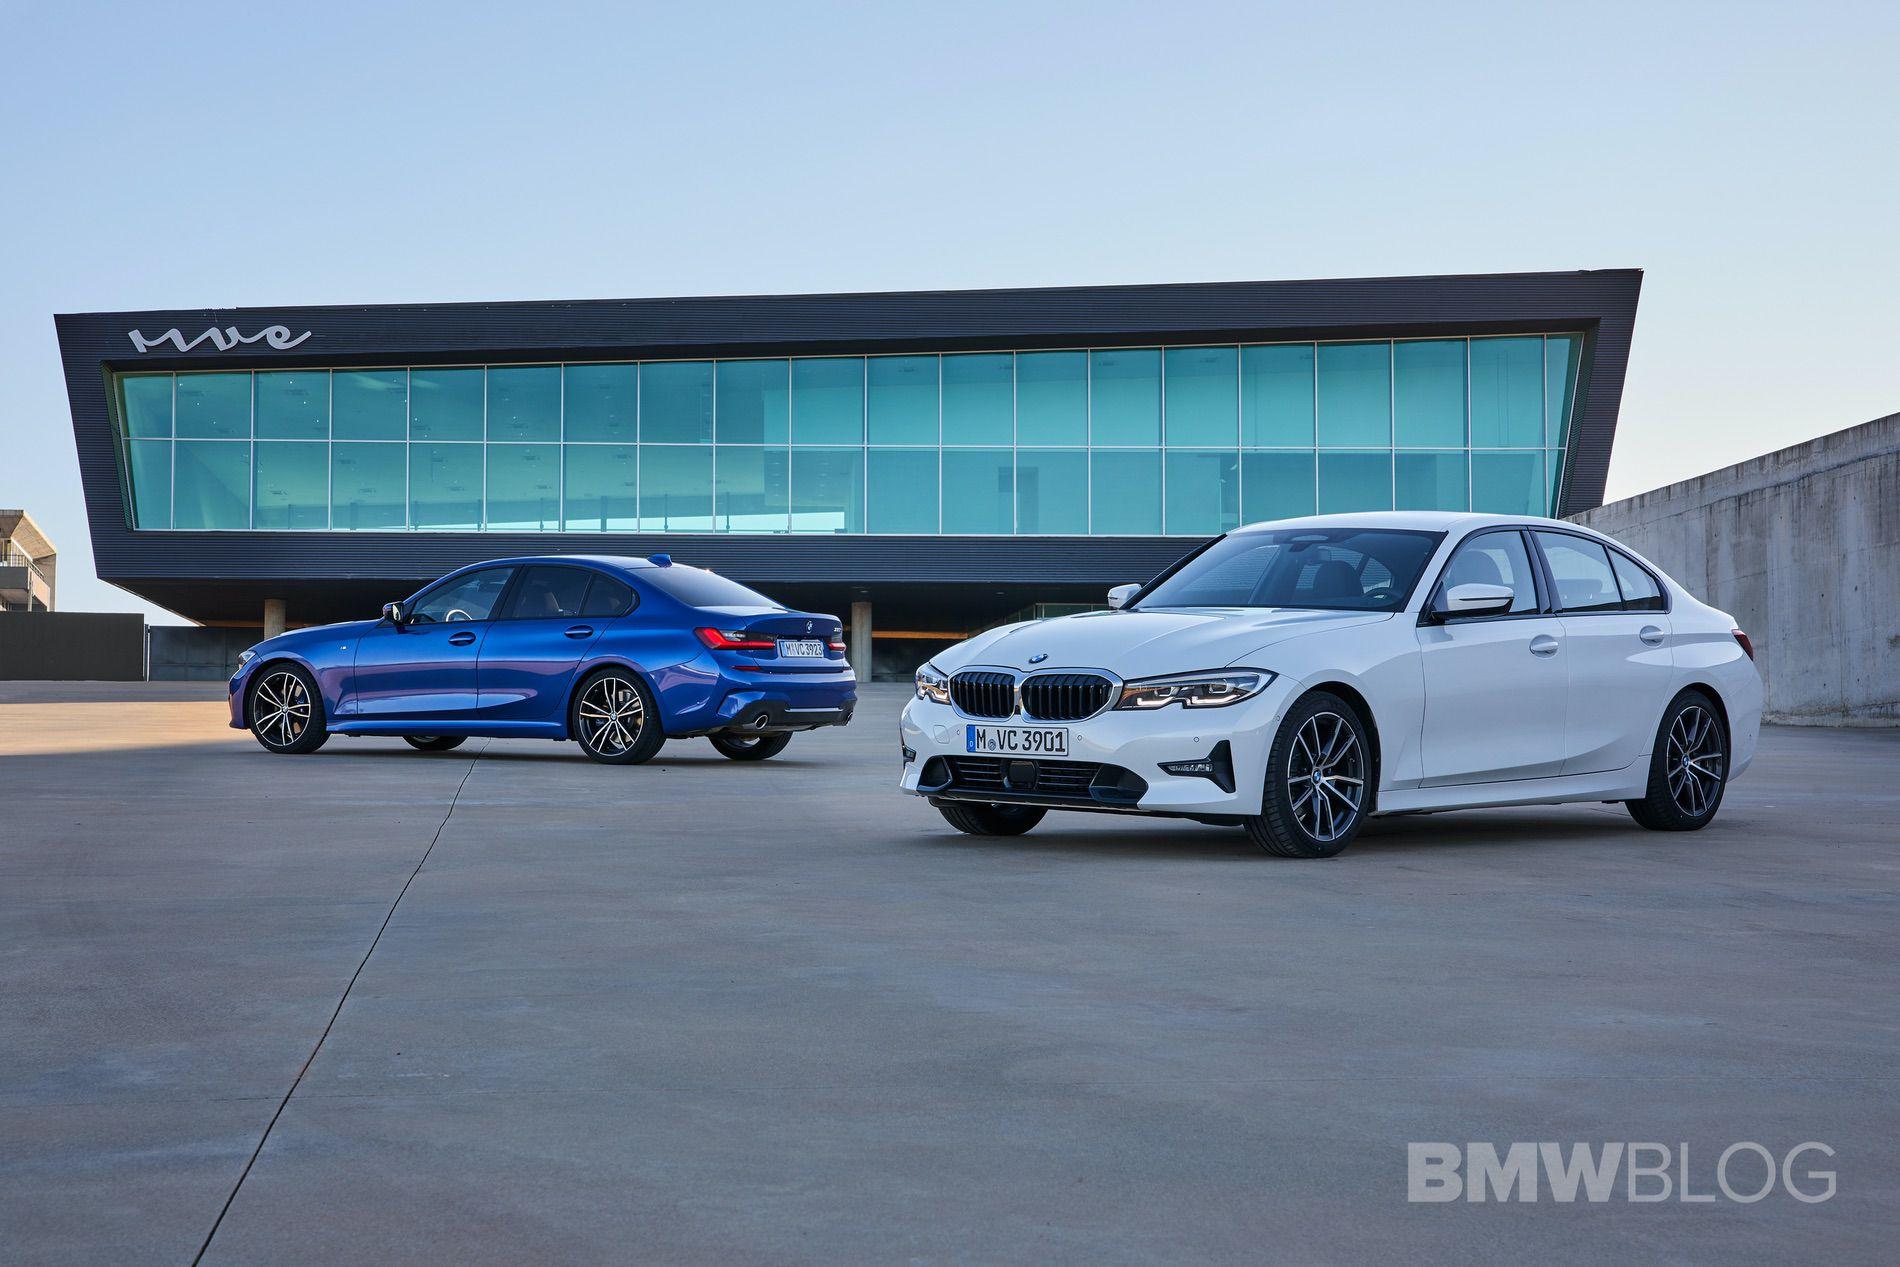 2019 BMW 320d G20 test drive 88